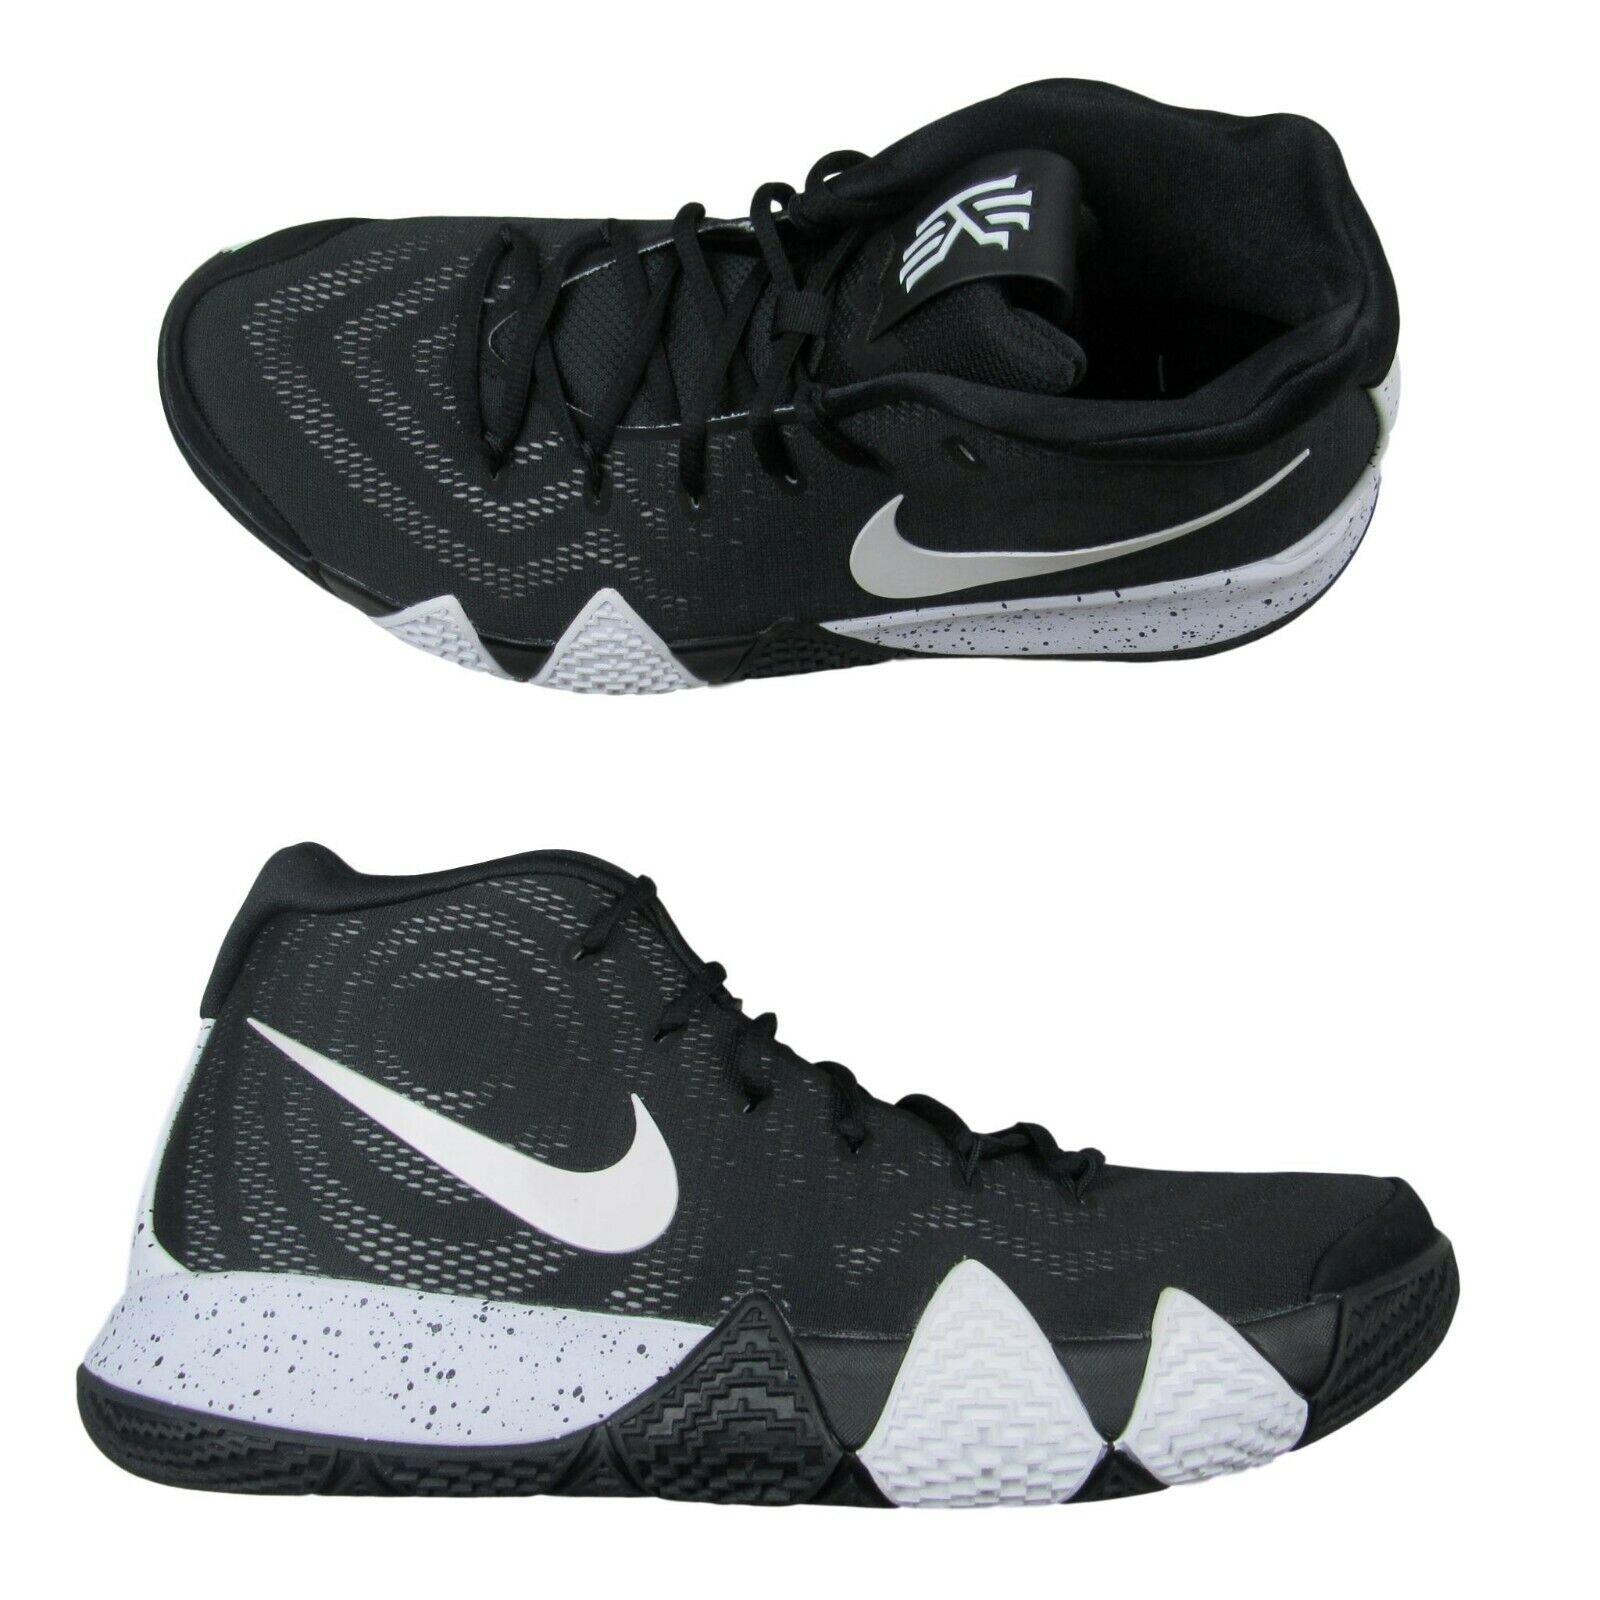 nike kyrie 4 4 4 tb mens scarpe da basket 46 oreo bianco nero av2296 001 nuova 5992ee